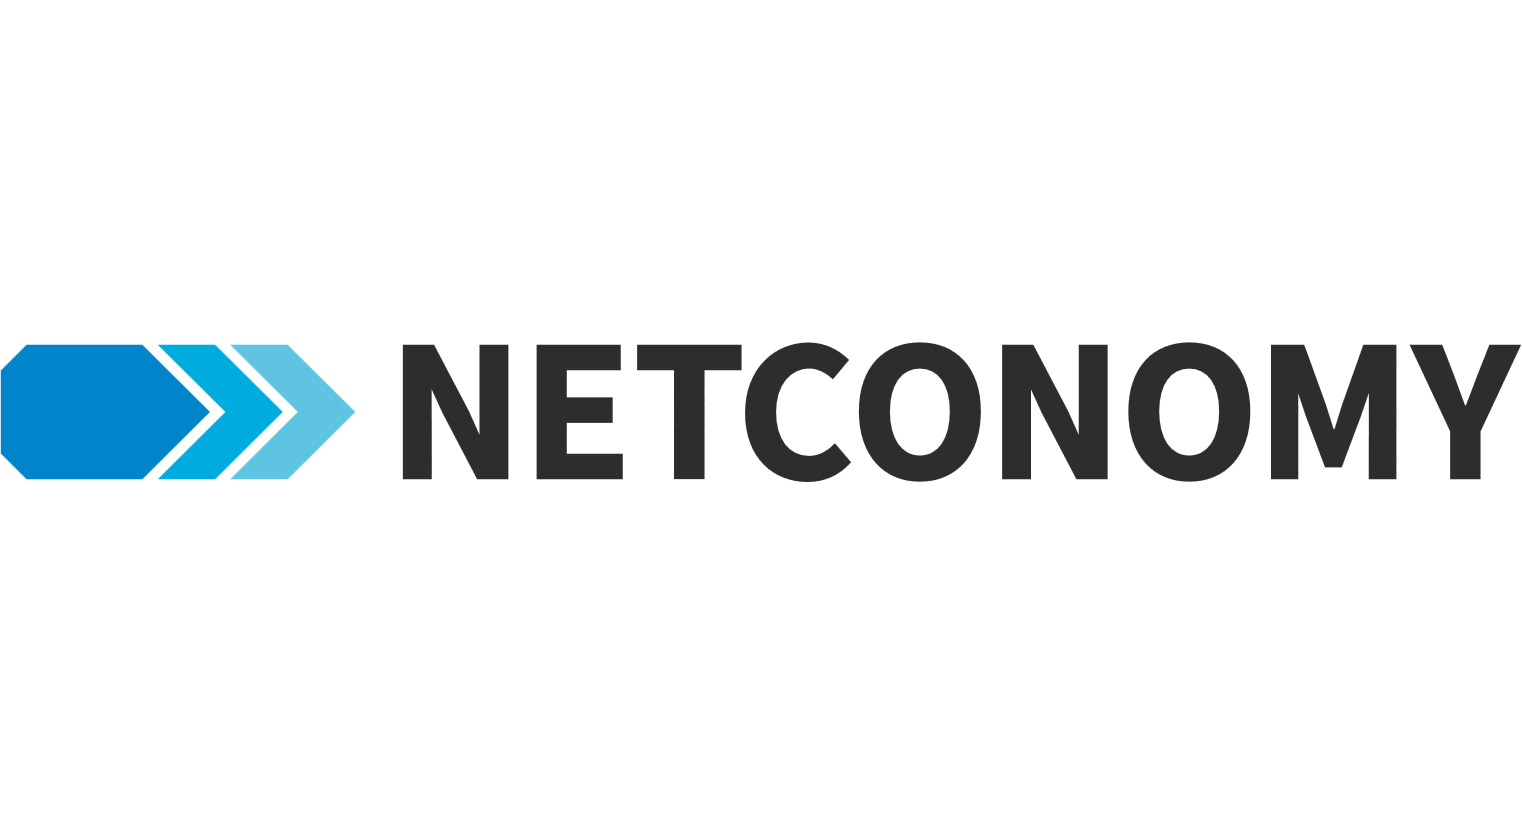 Netconomy FI